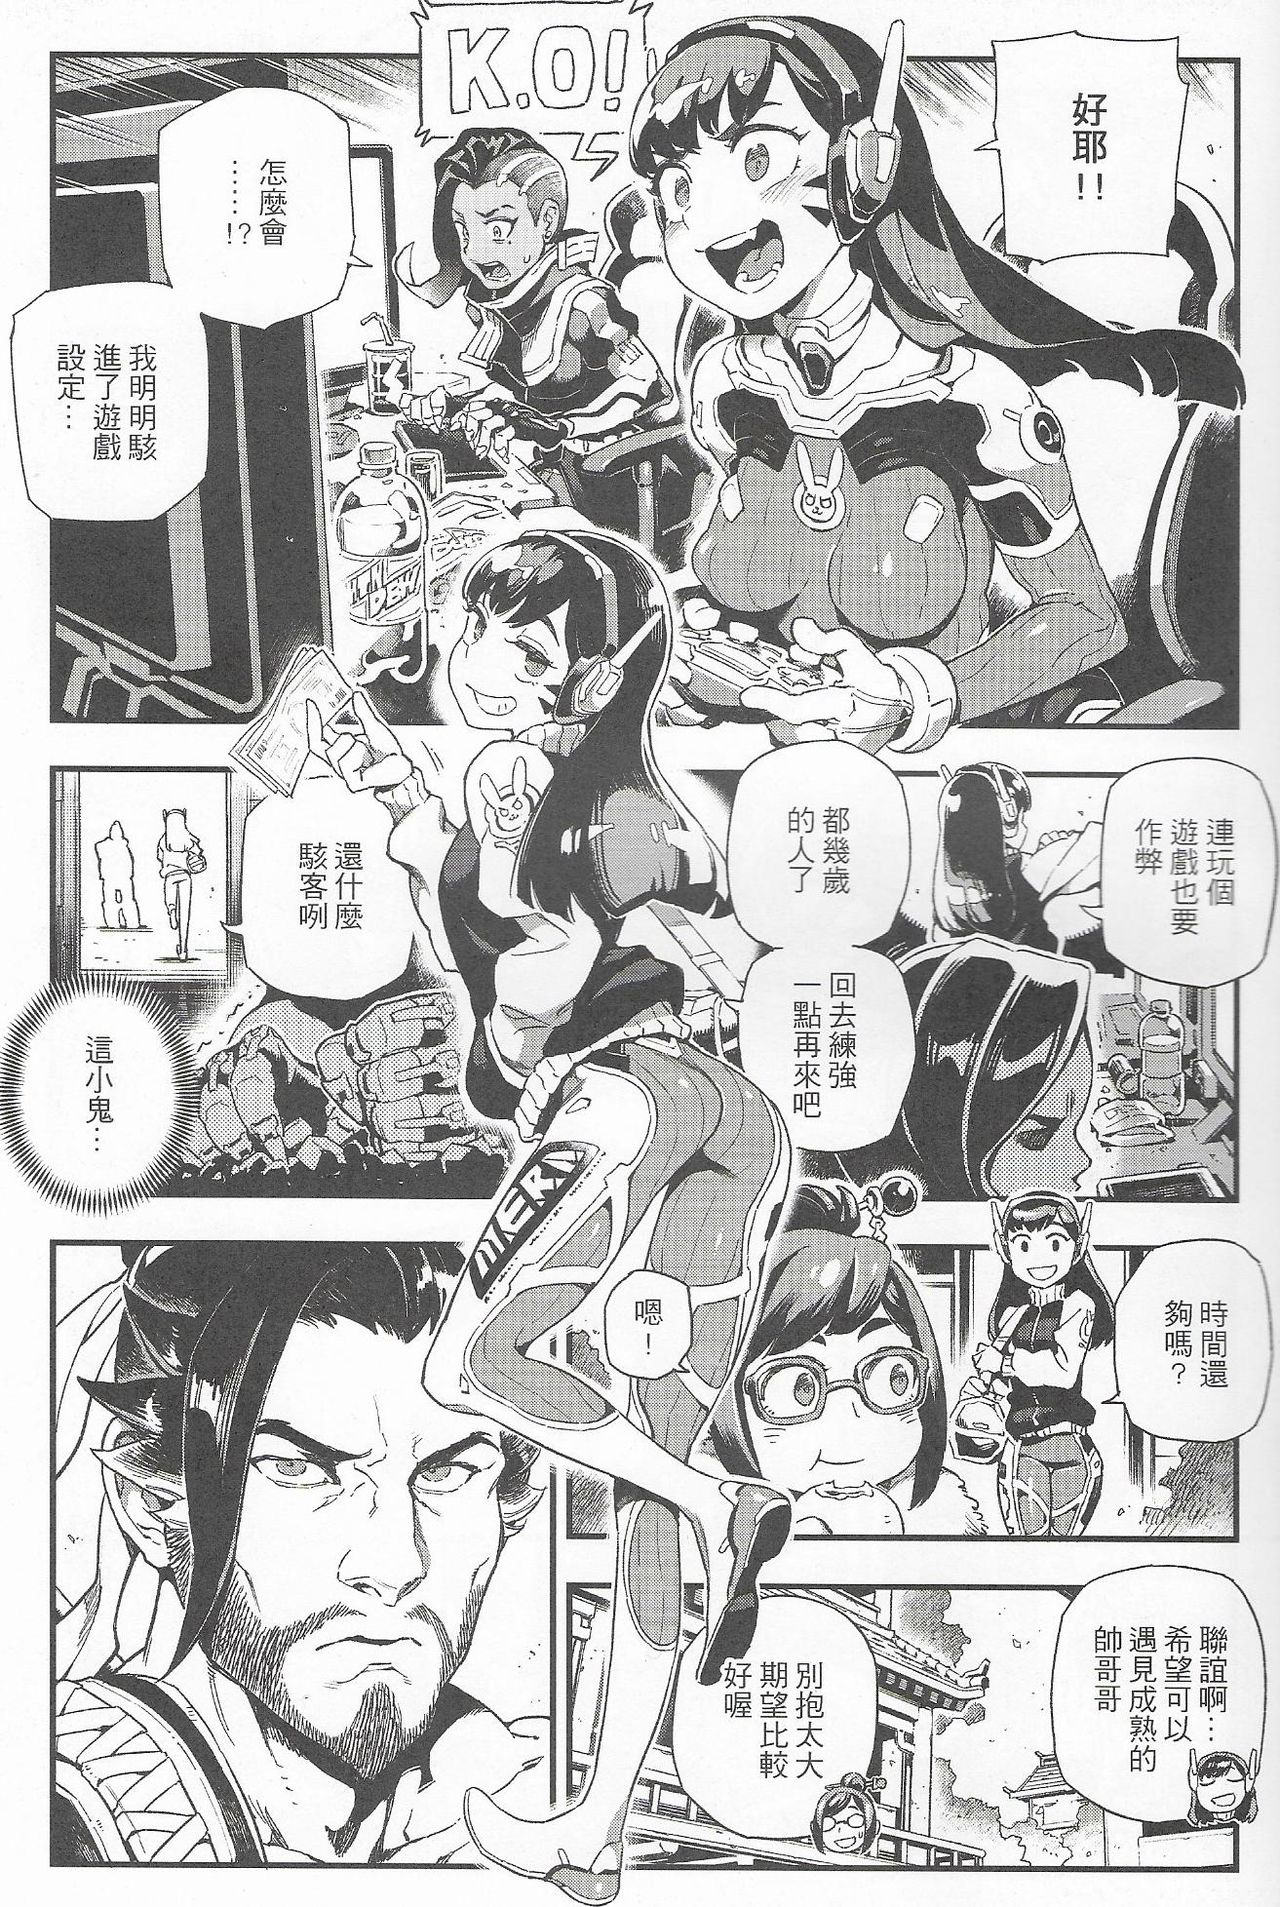 [CN] Hirame ~ OVERTIME!!! VOL.2 Hentai